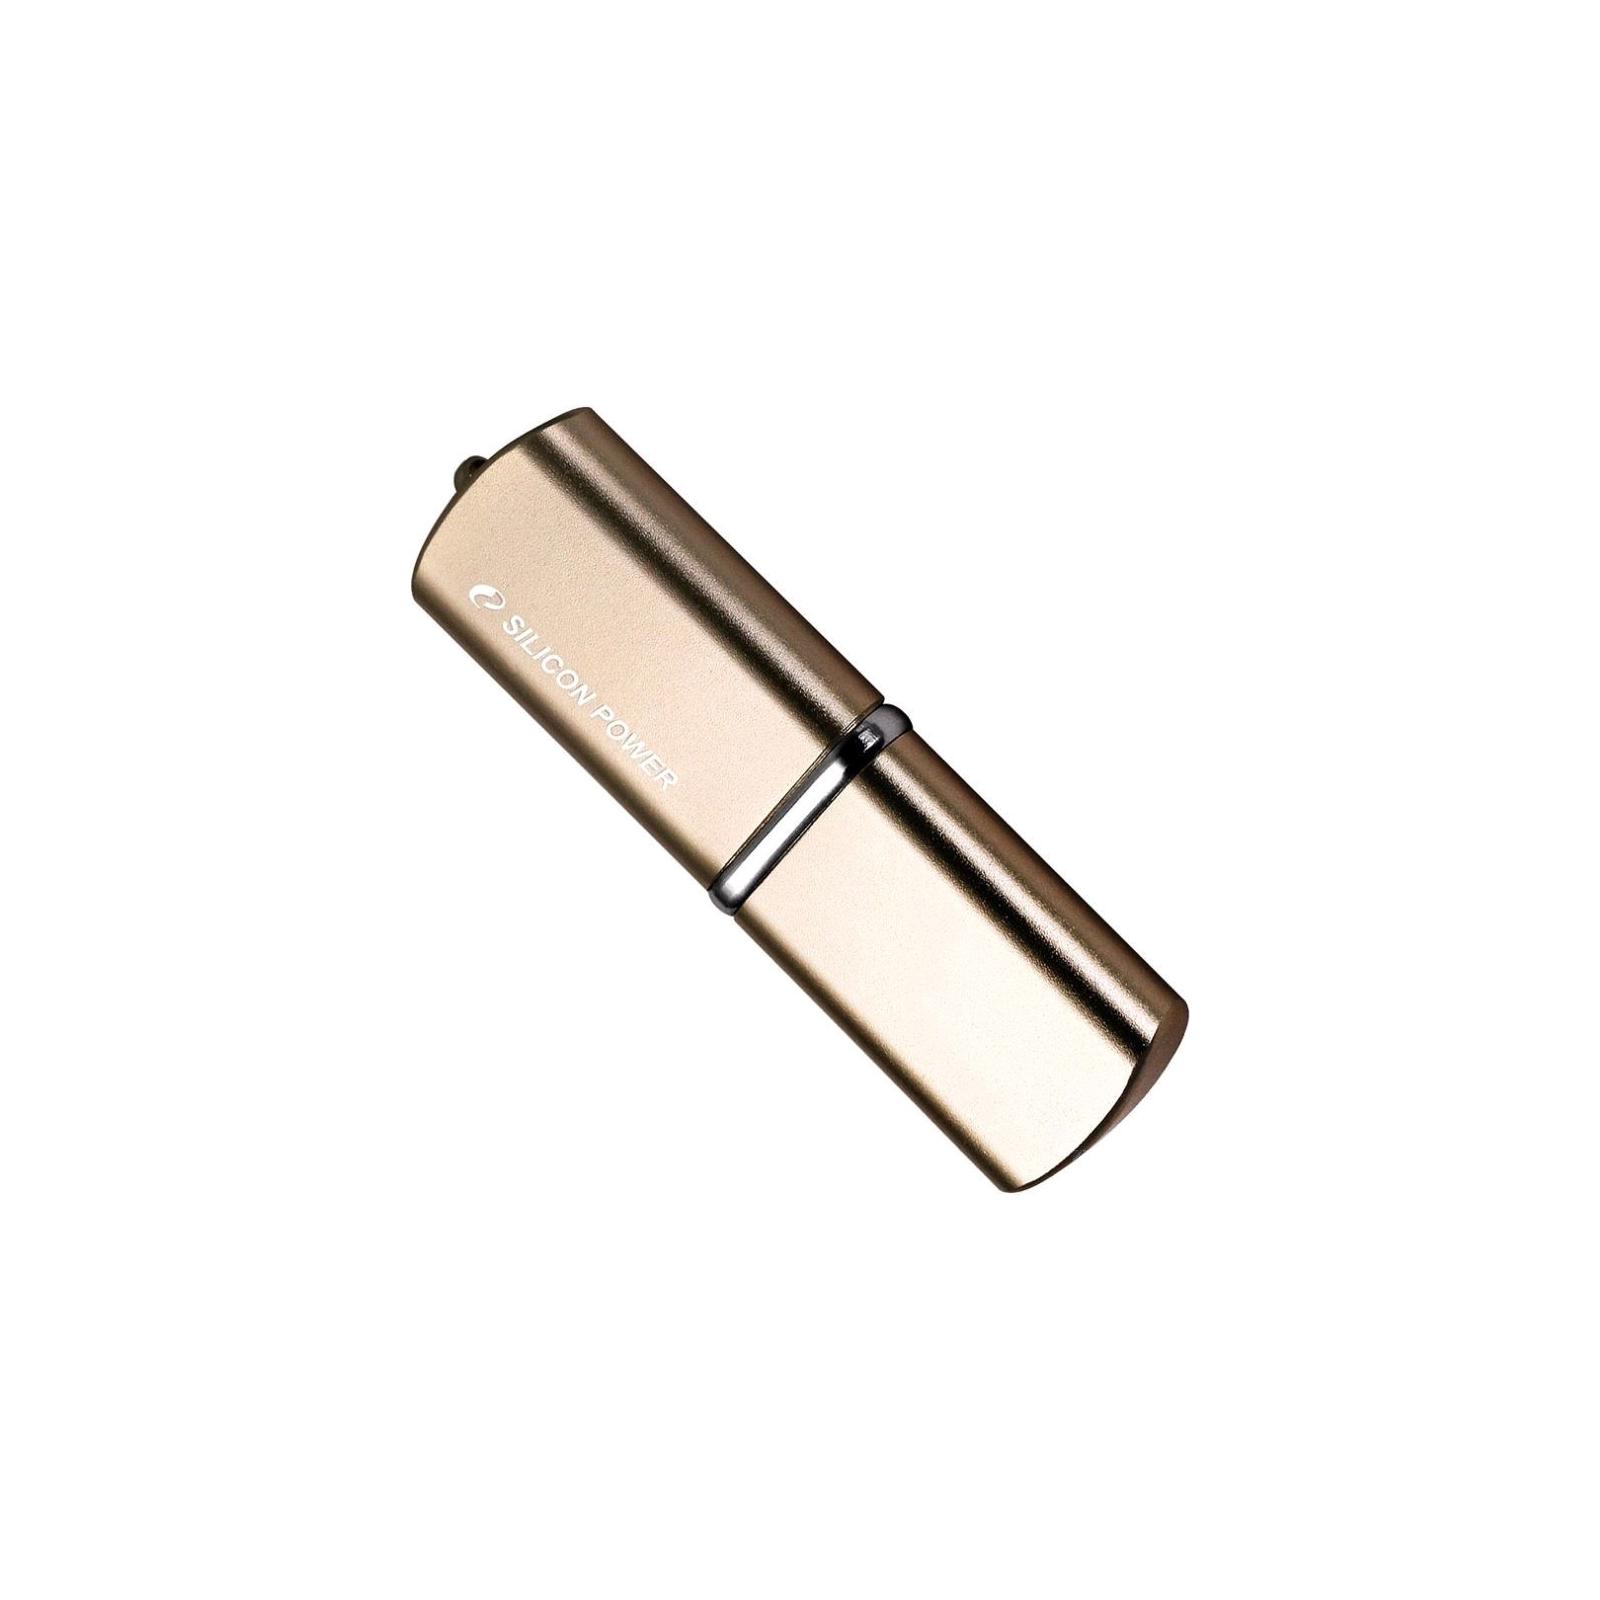 USB флеш накопитель Silicon Power 64GB LuxMini 720 USB 2.0 (SP064GBUF2720V1D) изображение 2